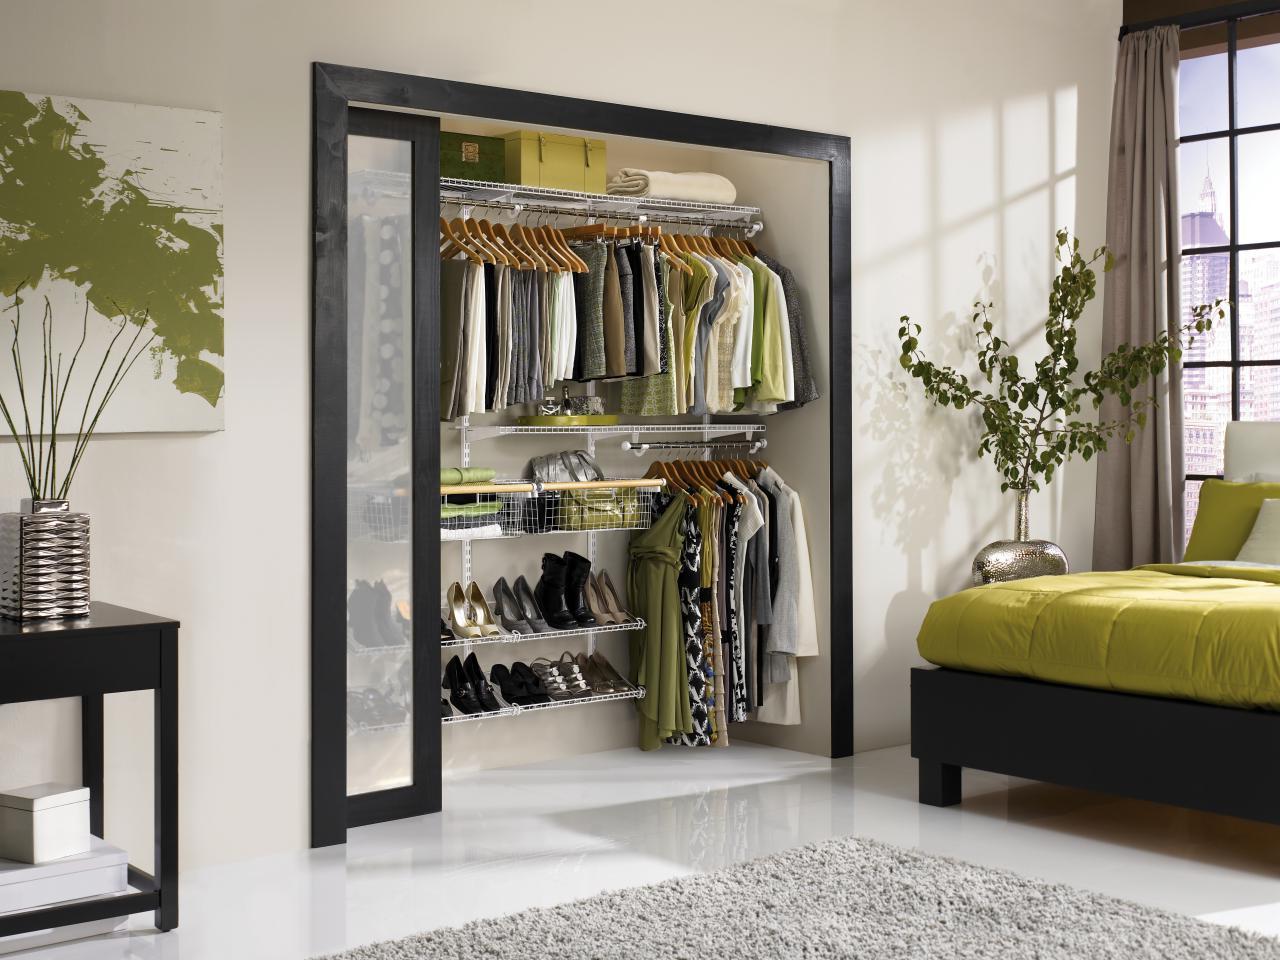 ordnung im schicken design 60 regalsysteme f r. Black Bedroom Furniture Sets. Home Design Ideas